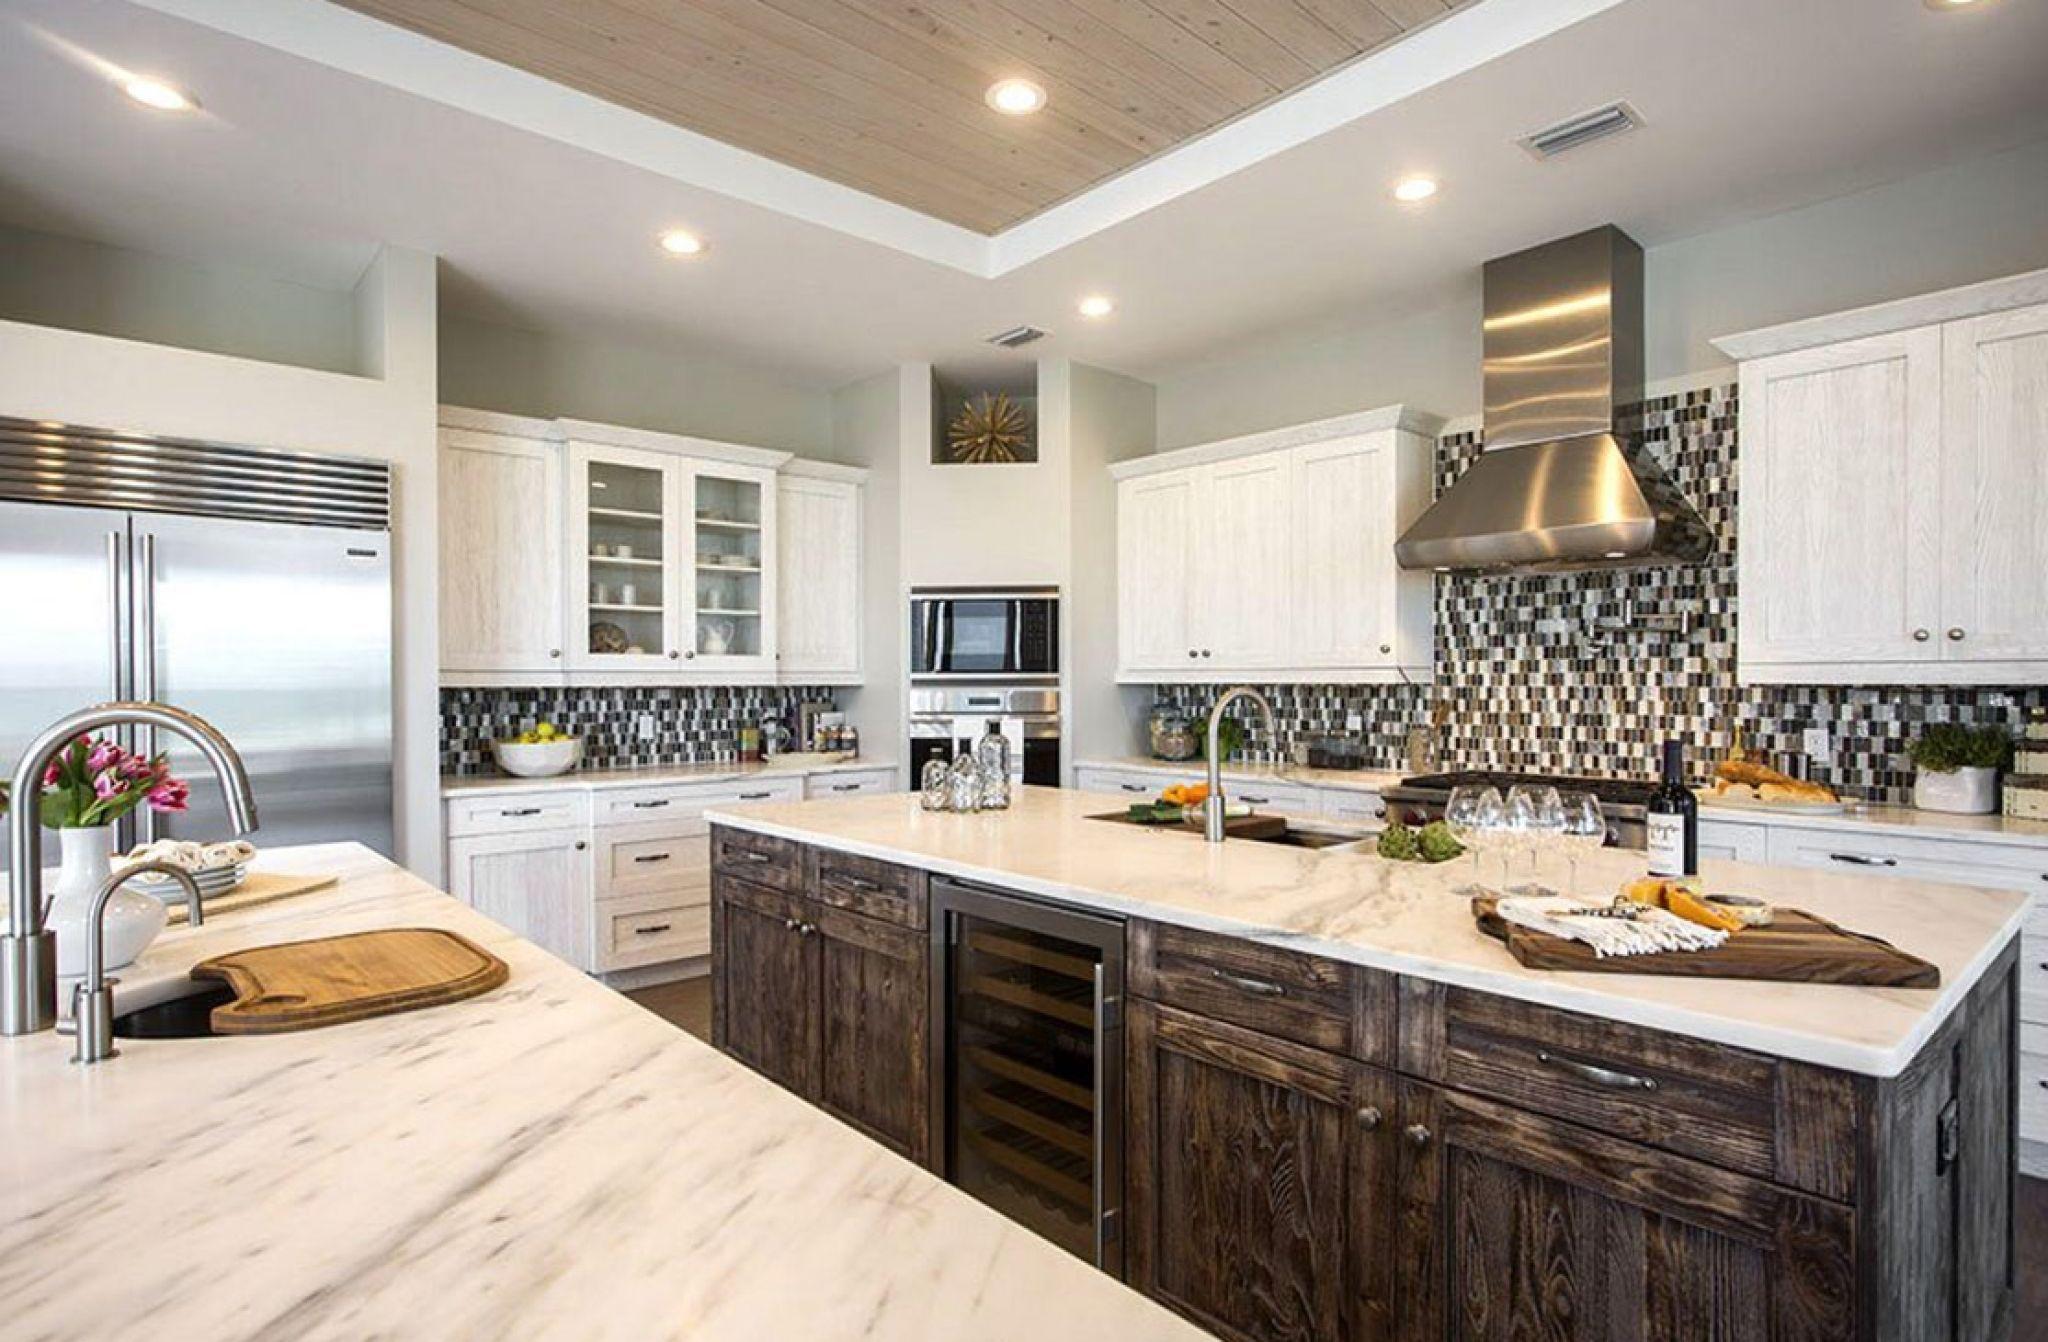 kitchen cabinets tampa fl - cheap kitchen cabinet remodel ideas ...